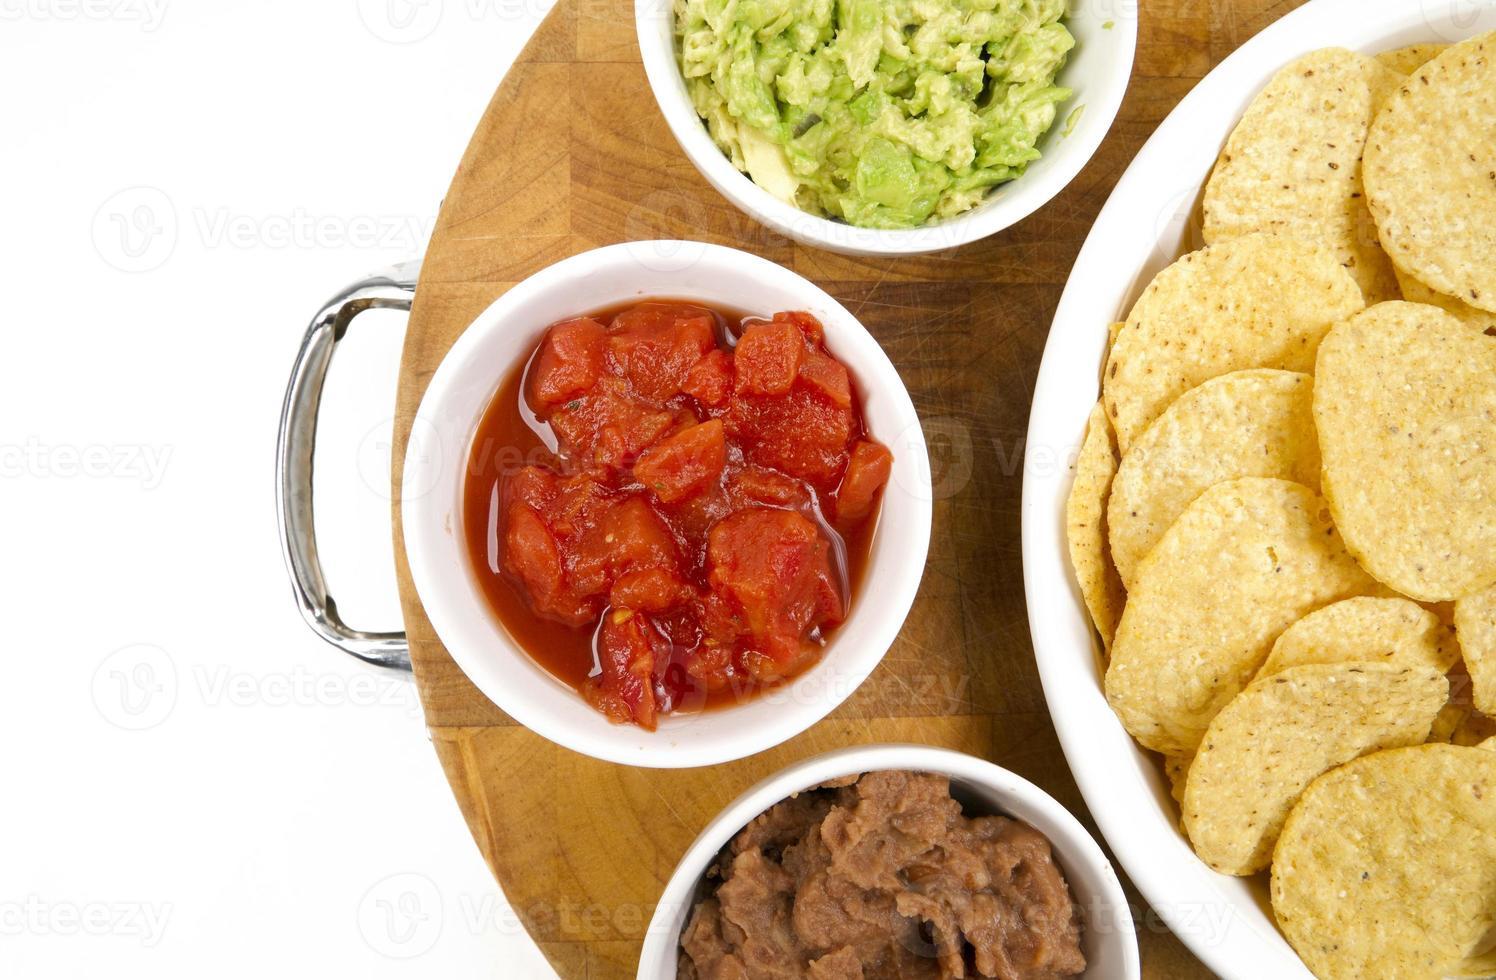 mat aptitretare chips salsa refried bönor guacamole trä skärbräda foto